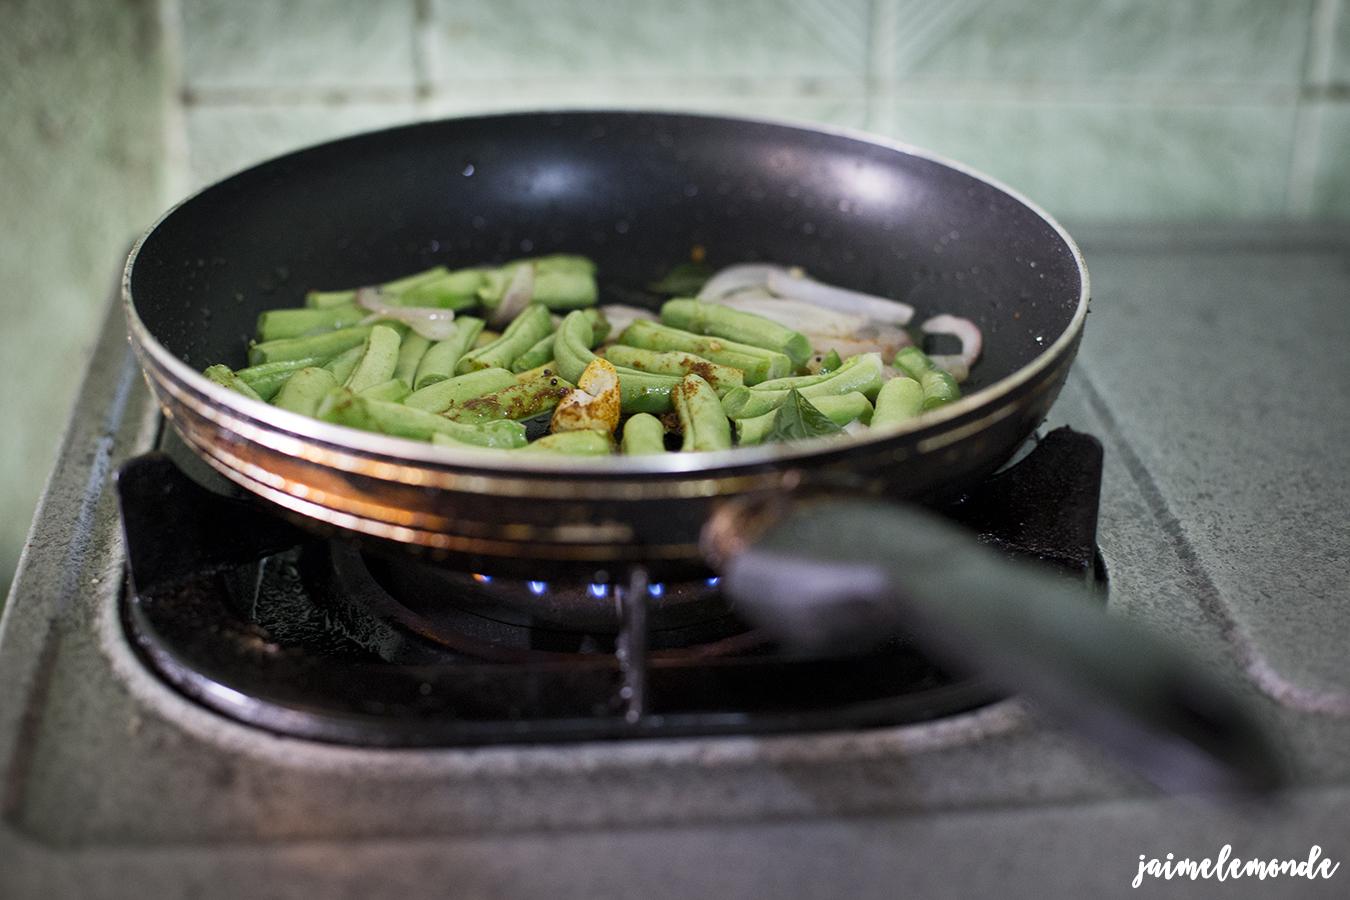 negombo-apprendre-a-cuisiner-avec-ragu-negombo-beach-house-guest-house-voyage-au-sri-lanka-jaimelemonde-12